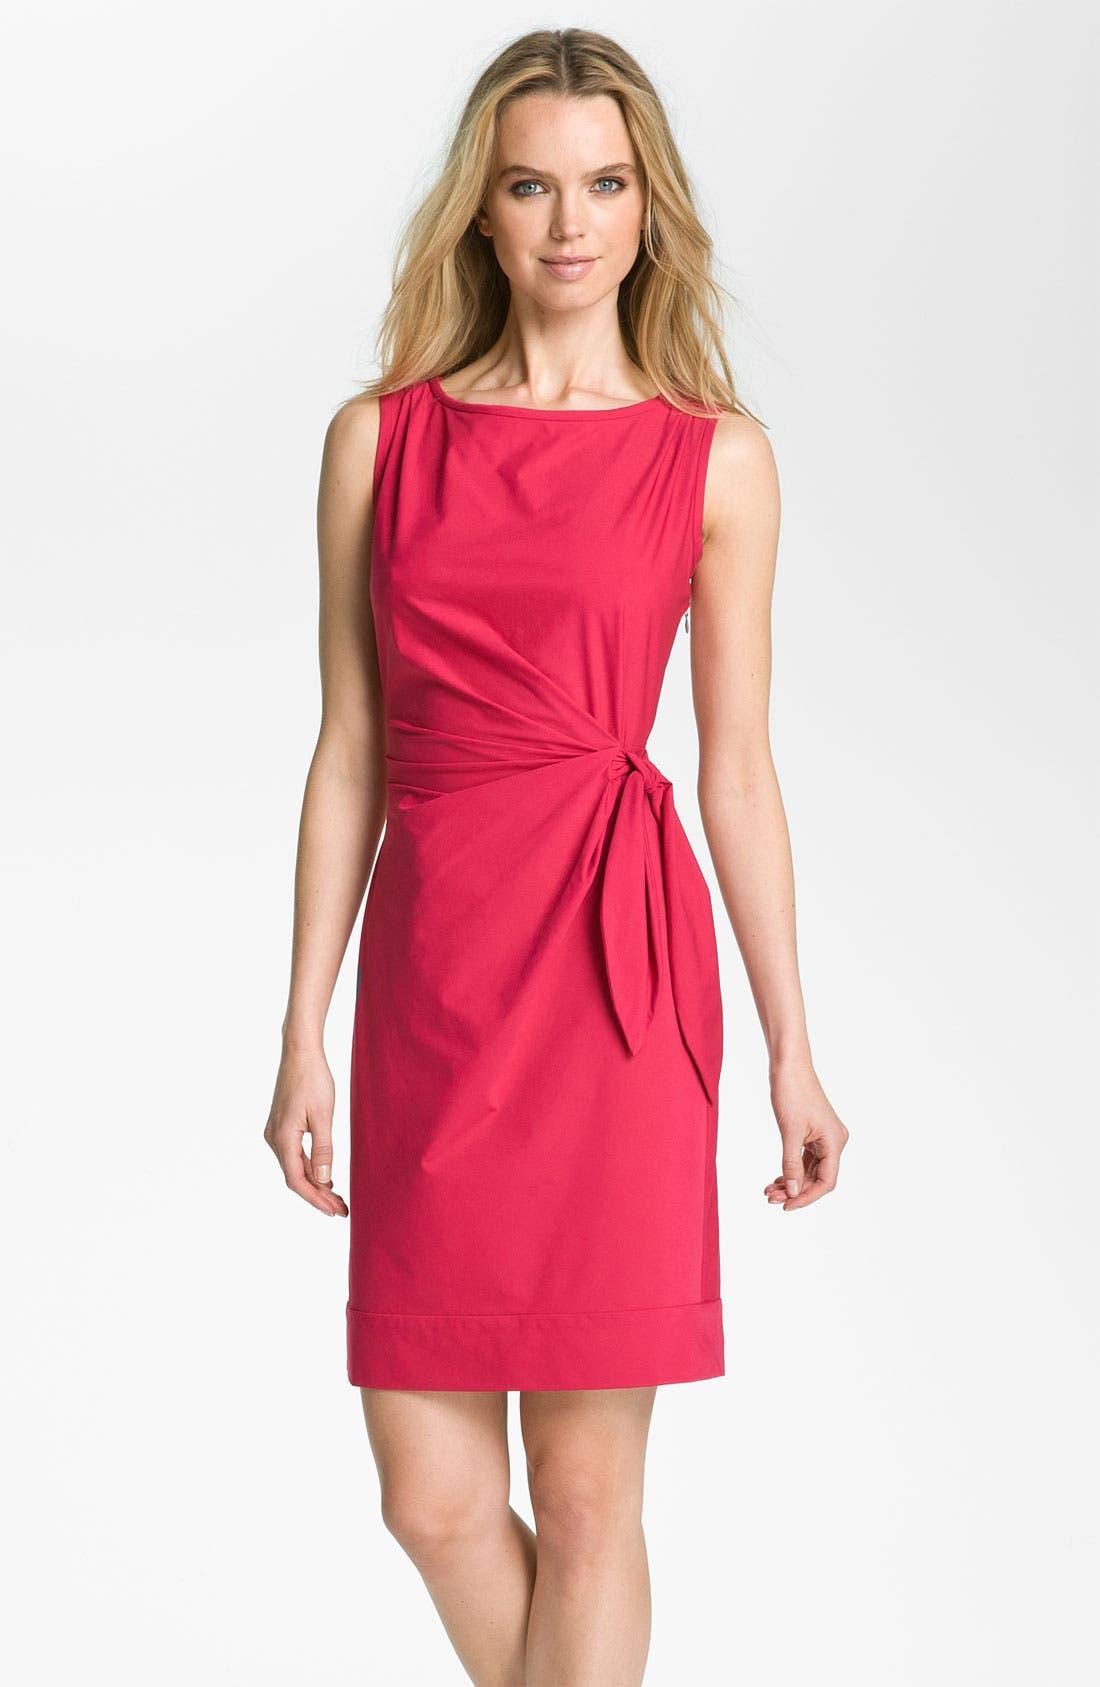 Alternate Image 1 Selected - Diane von Furstenberg 'Della 2' Dress